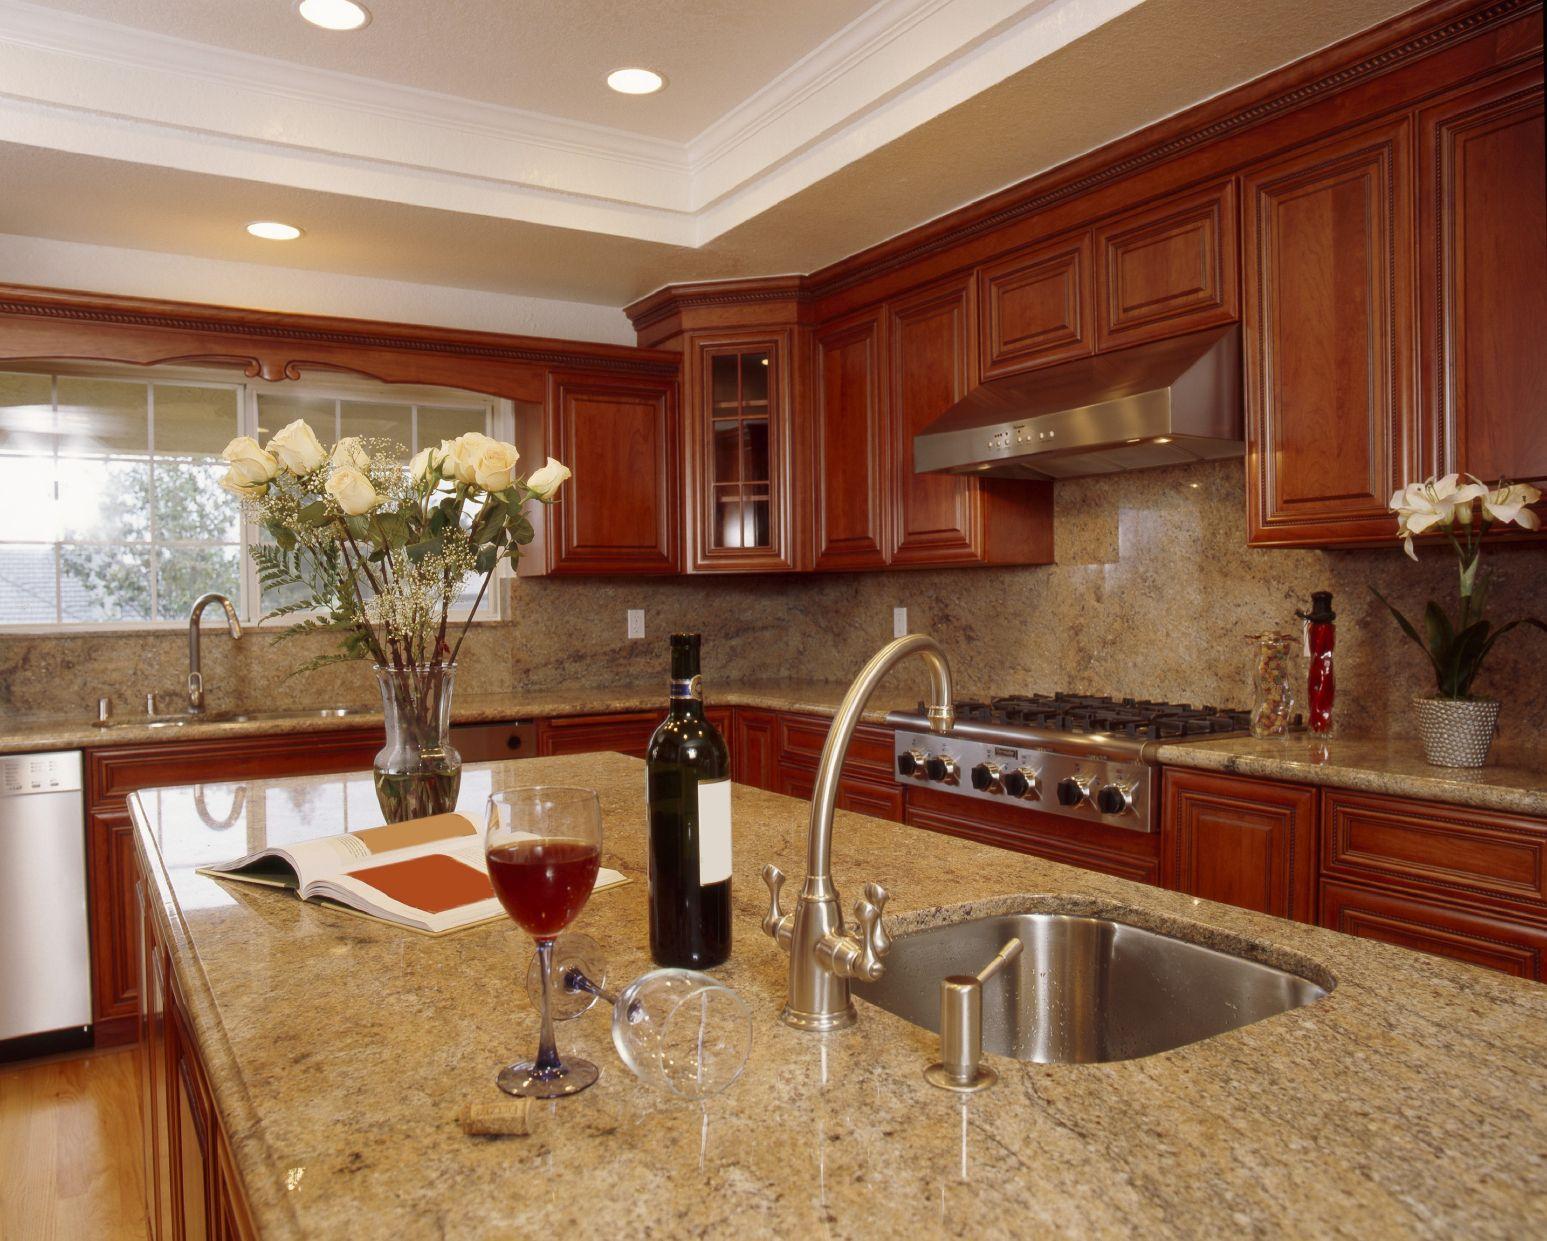 Detroit Marble Polishing And Cleaning U2013 Marble Floor Polishing .